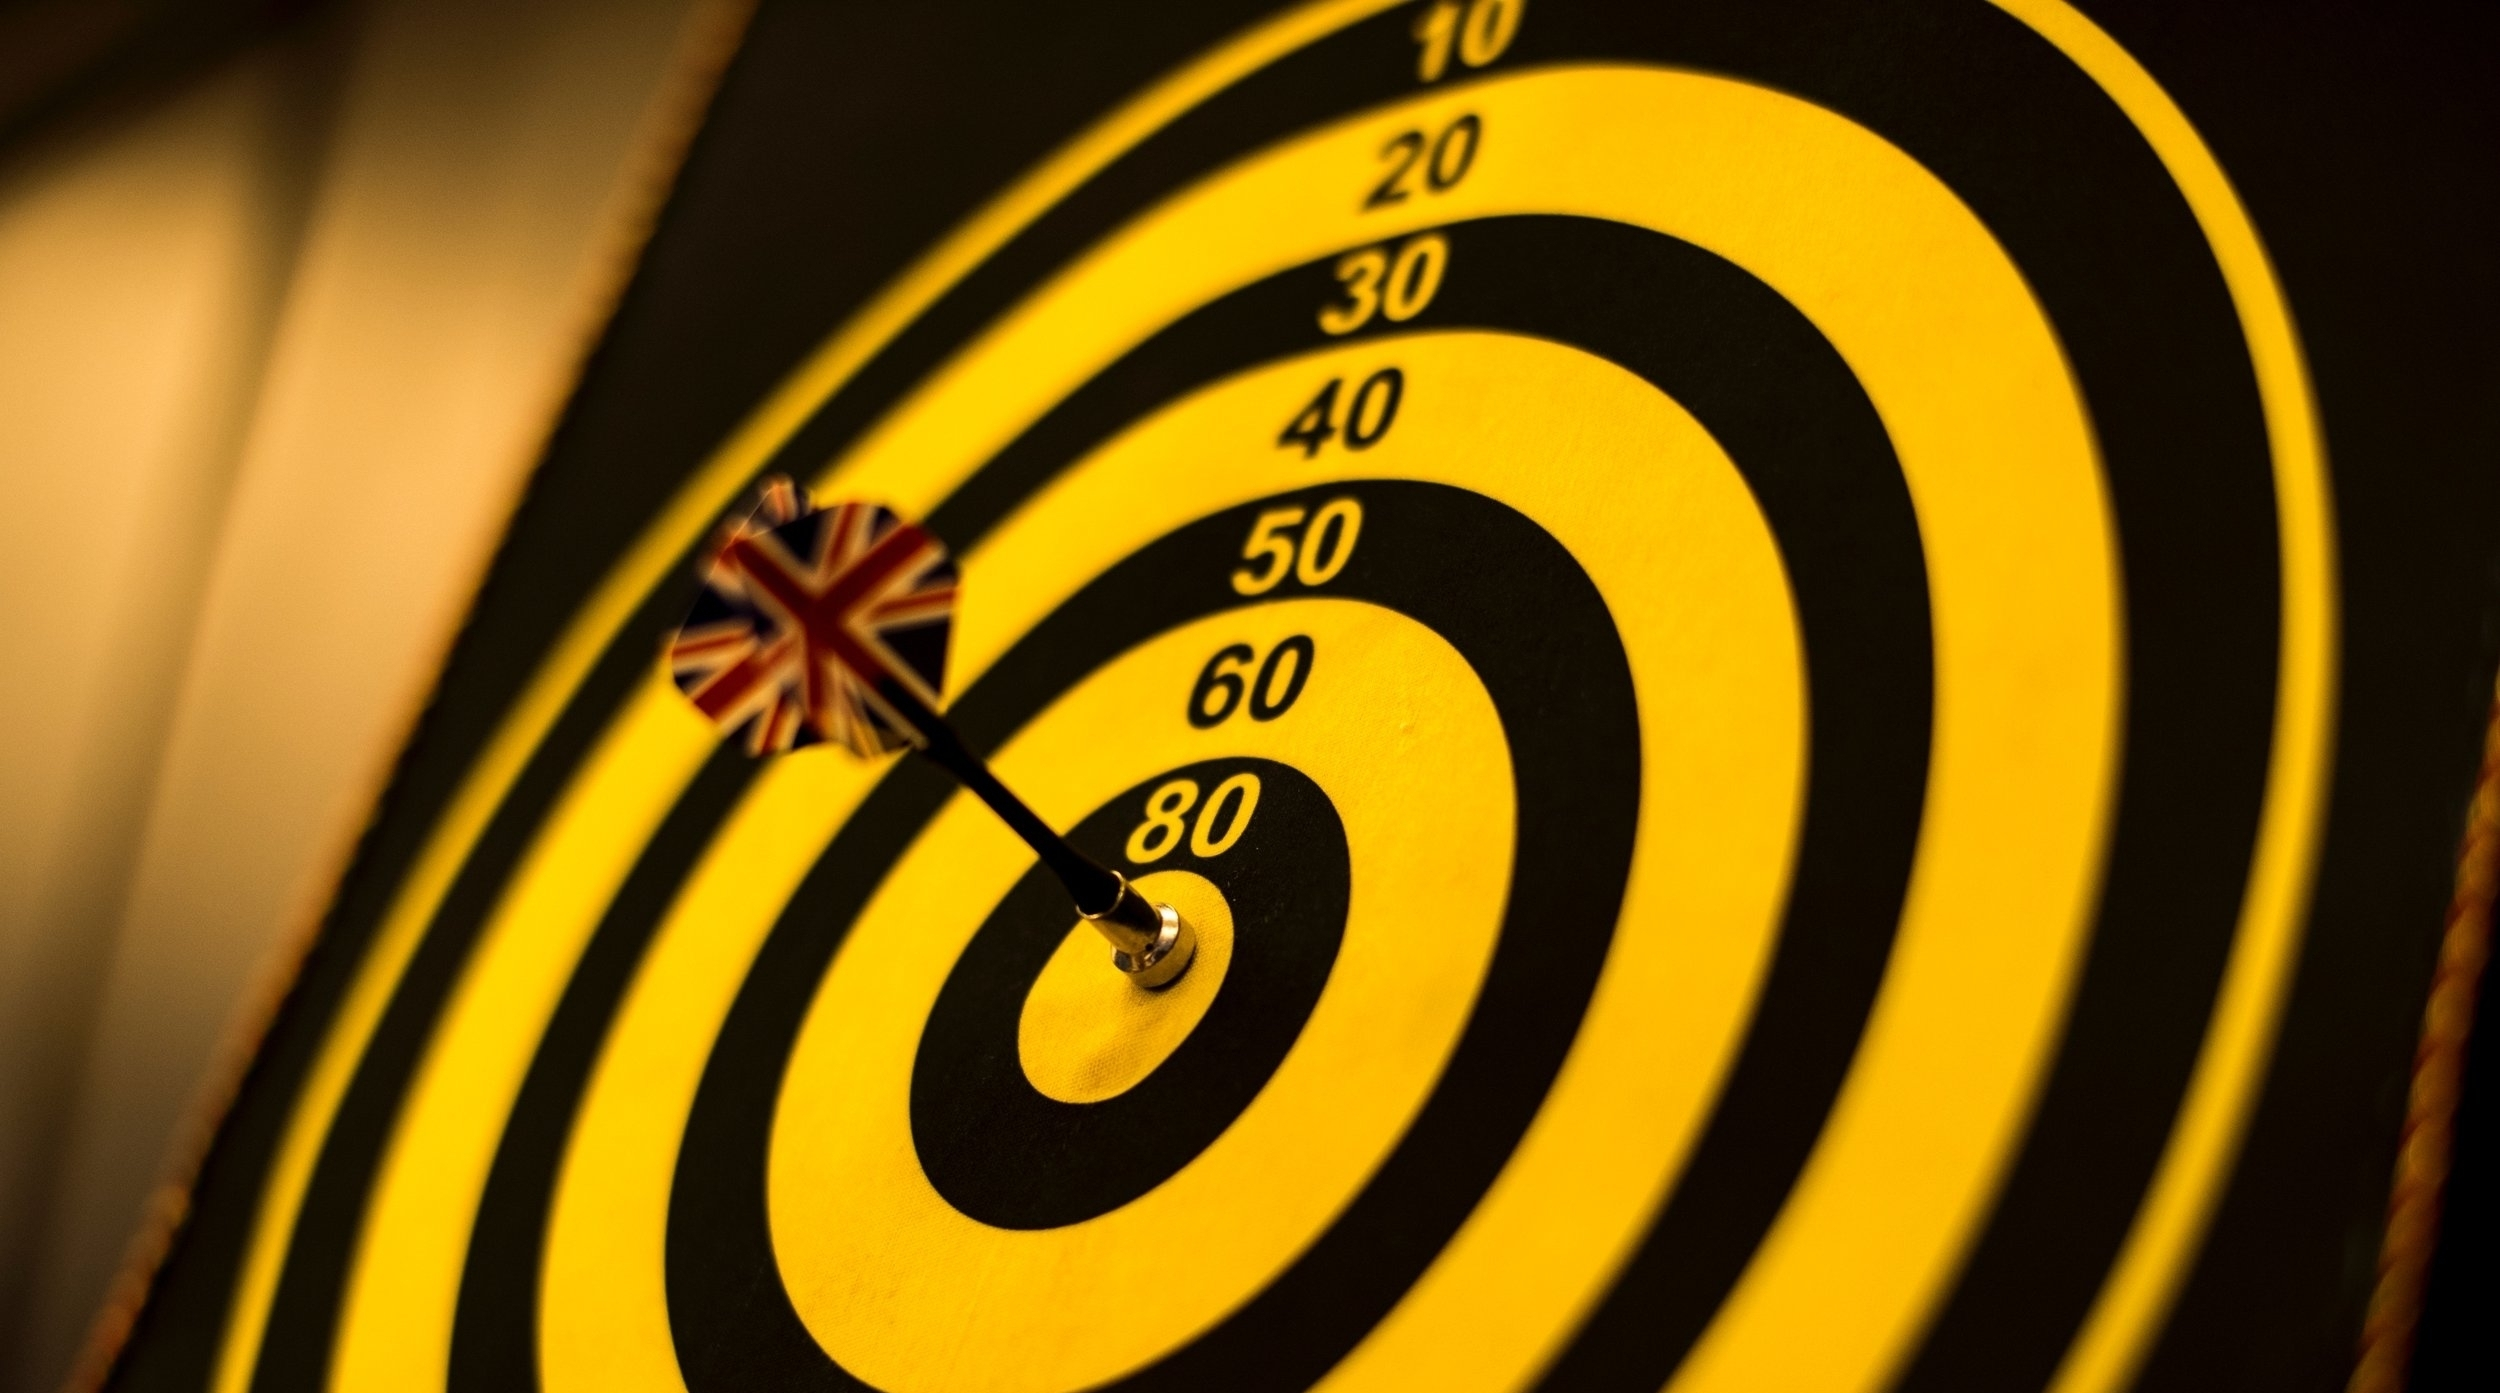 Goal setting & tracking progress